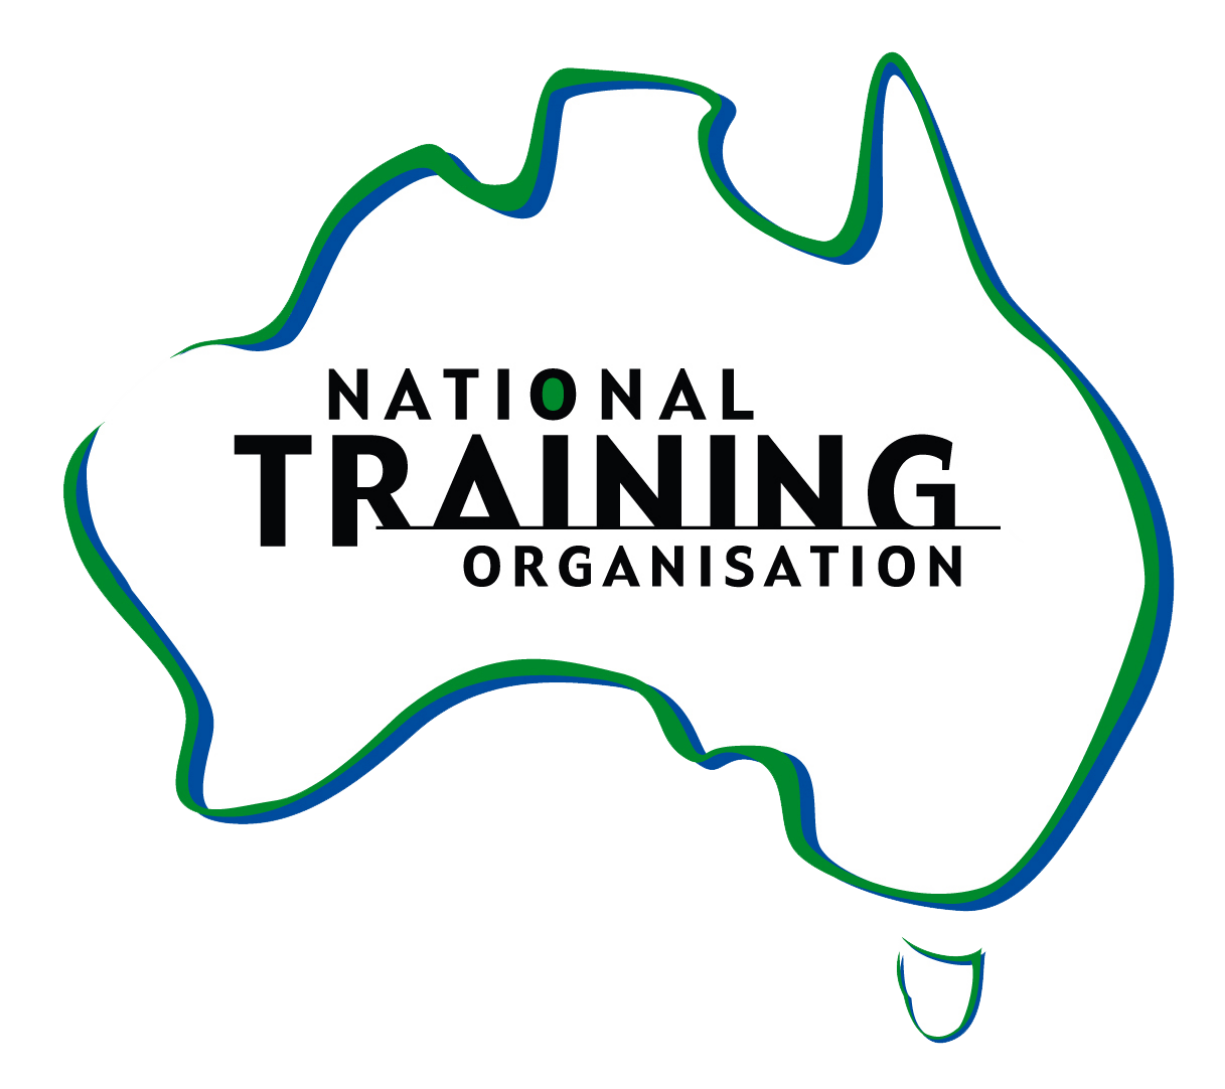 Bluecard Training Course National Training Organisation